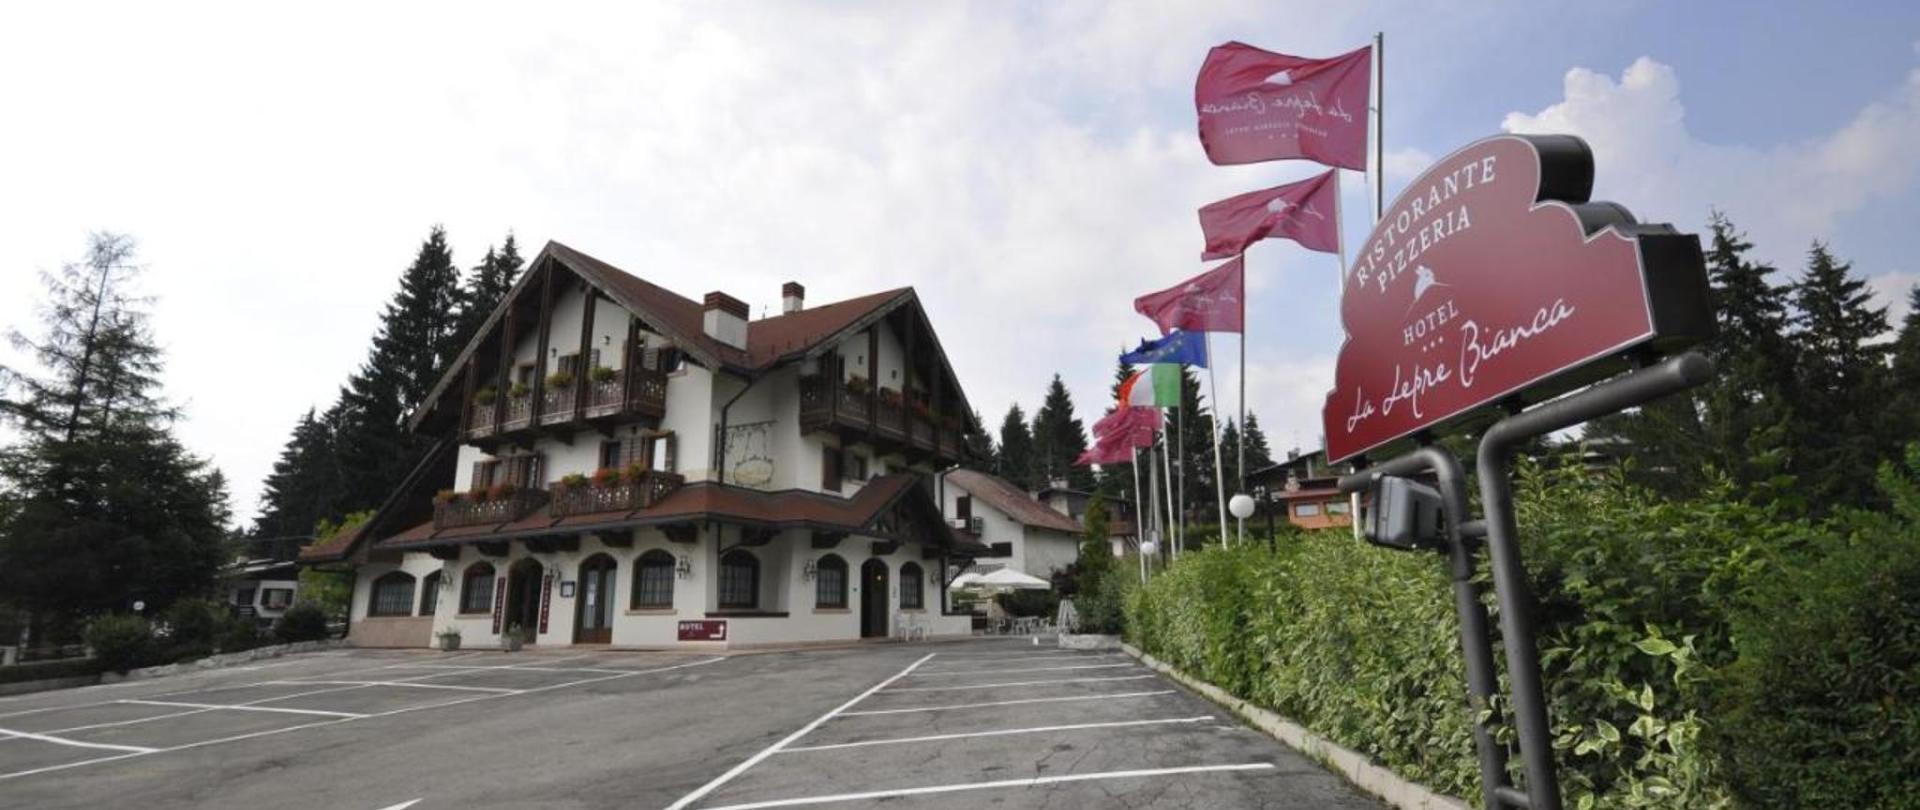 Hotel La Lepre Bianca